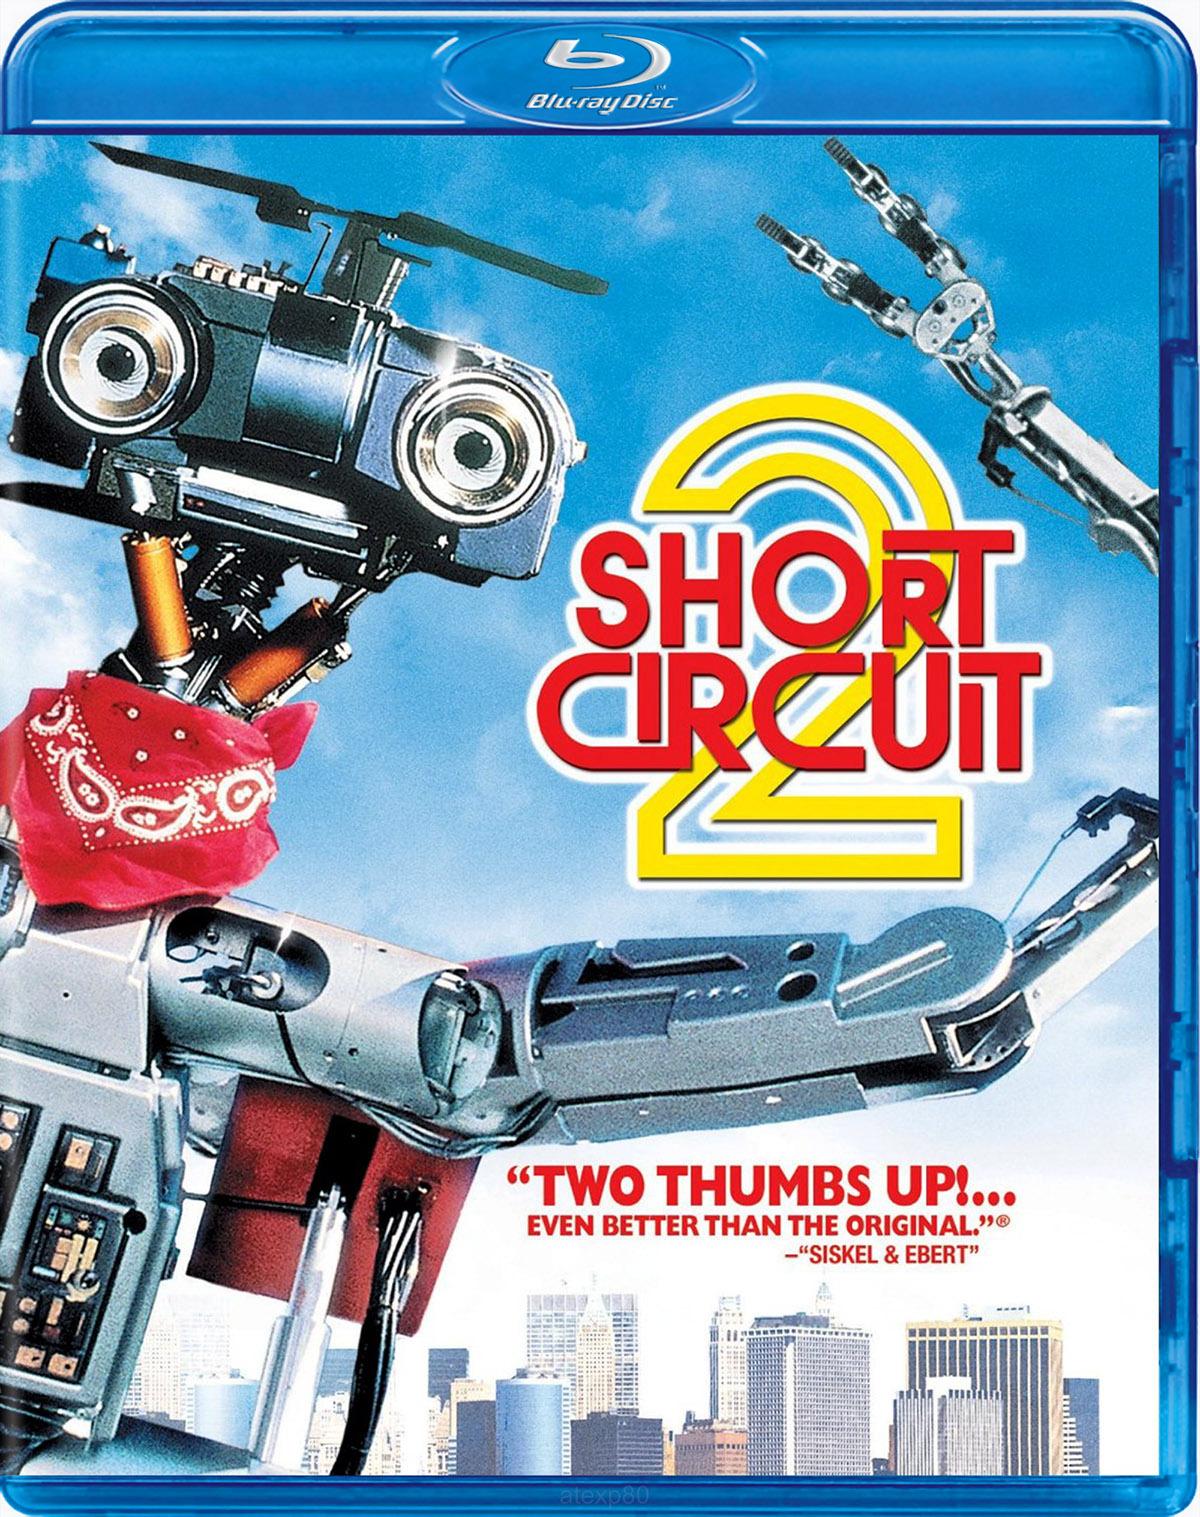 Short Circuit 2 [Blu-ray] [1988] $5.99 - $5.99